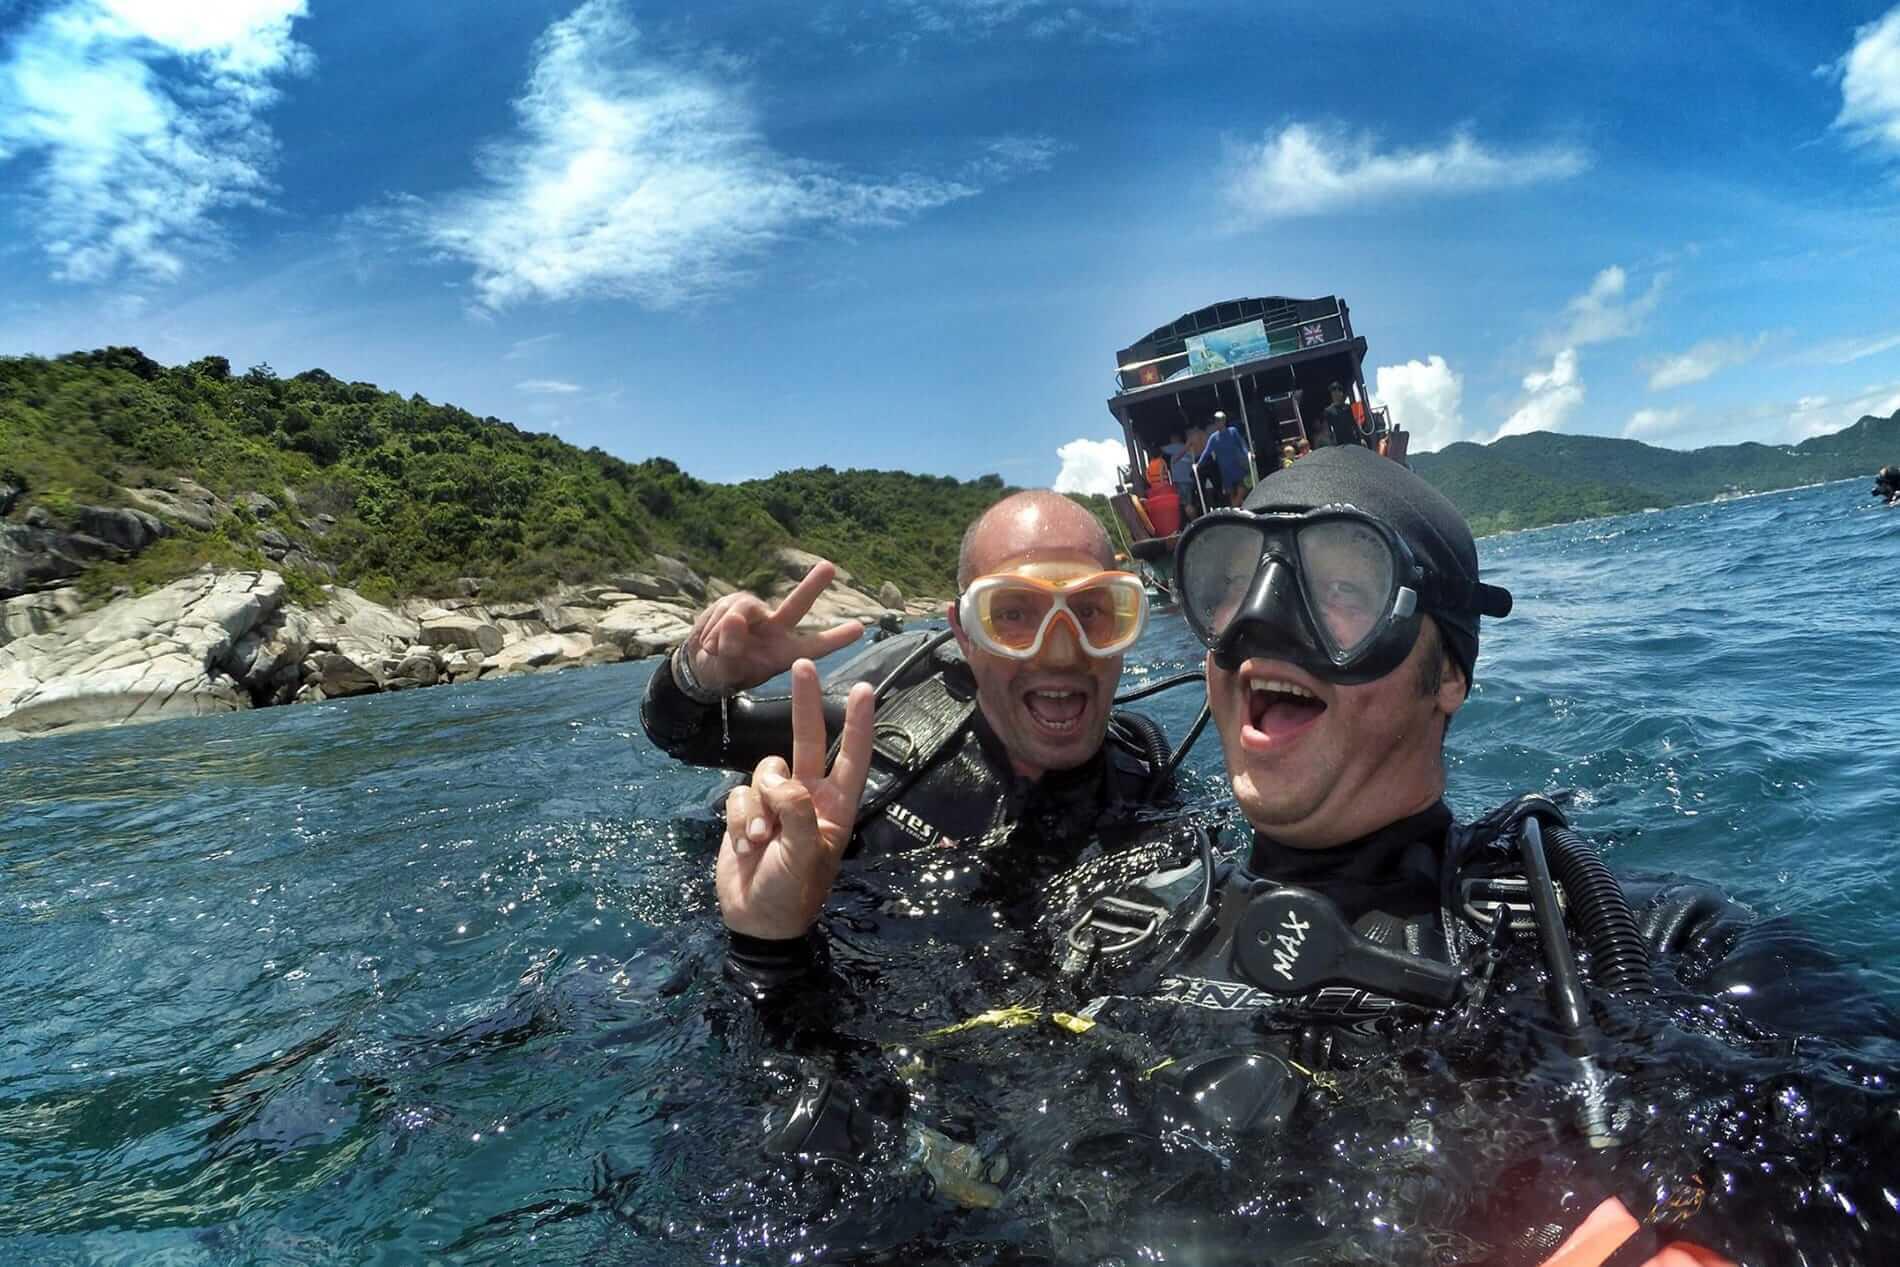 Happy divers create an epic selfie